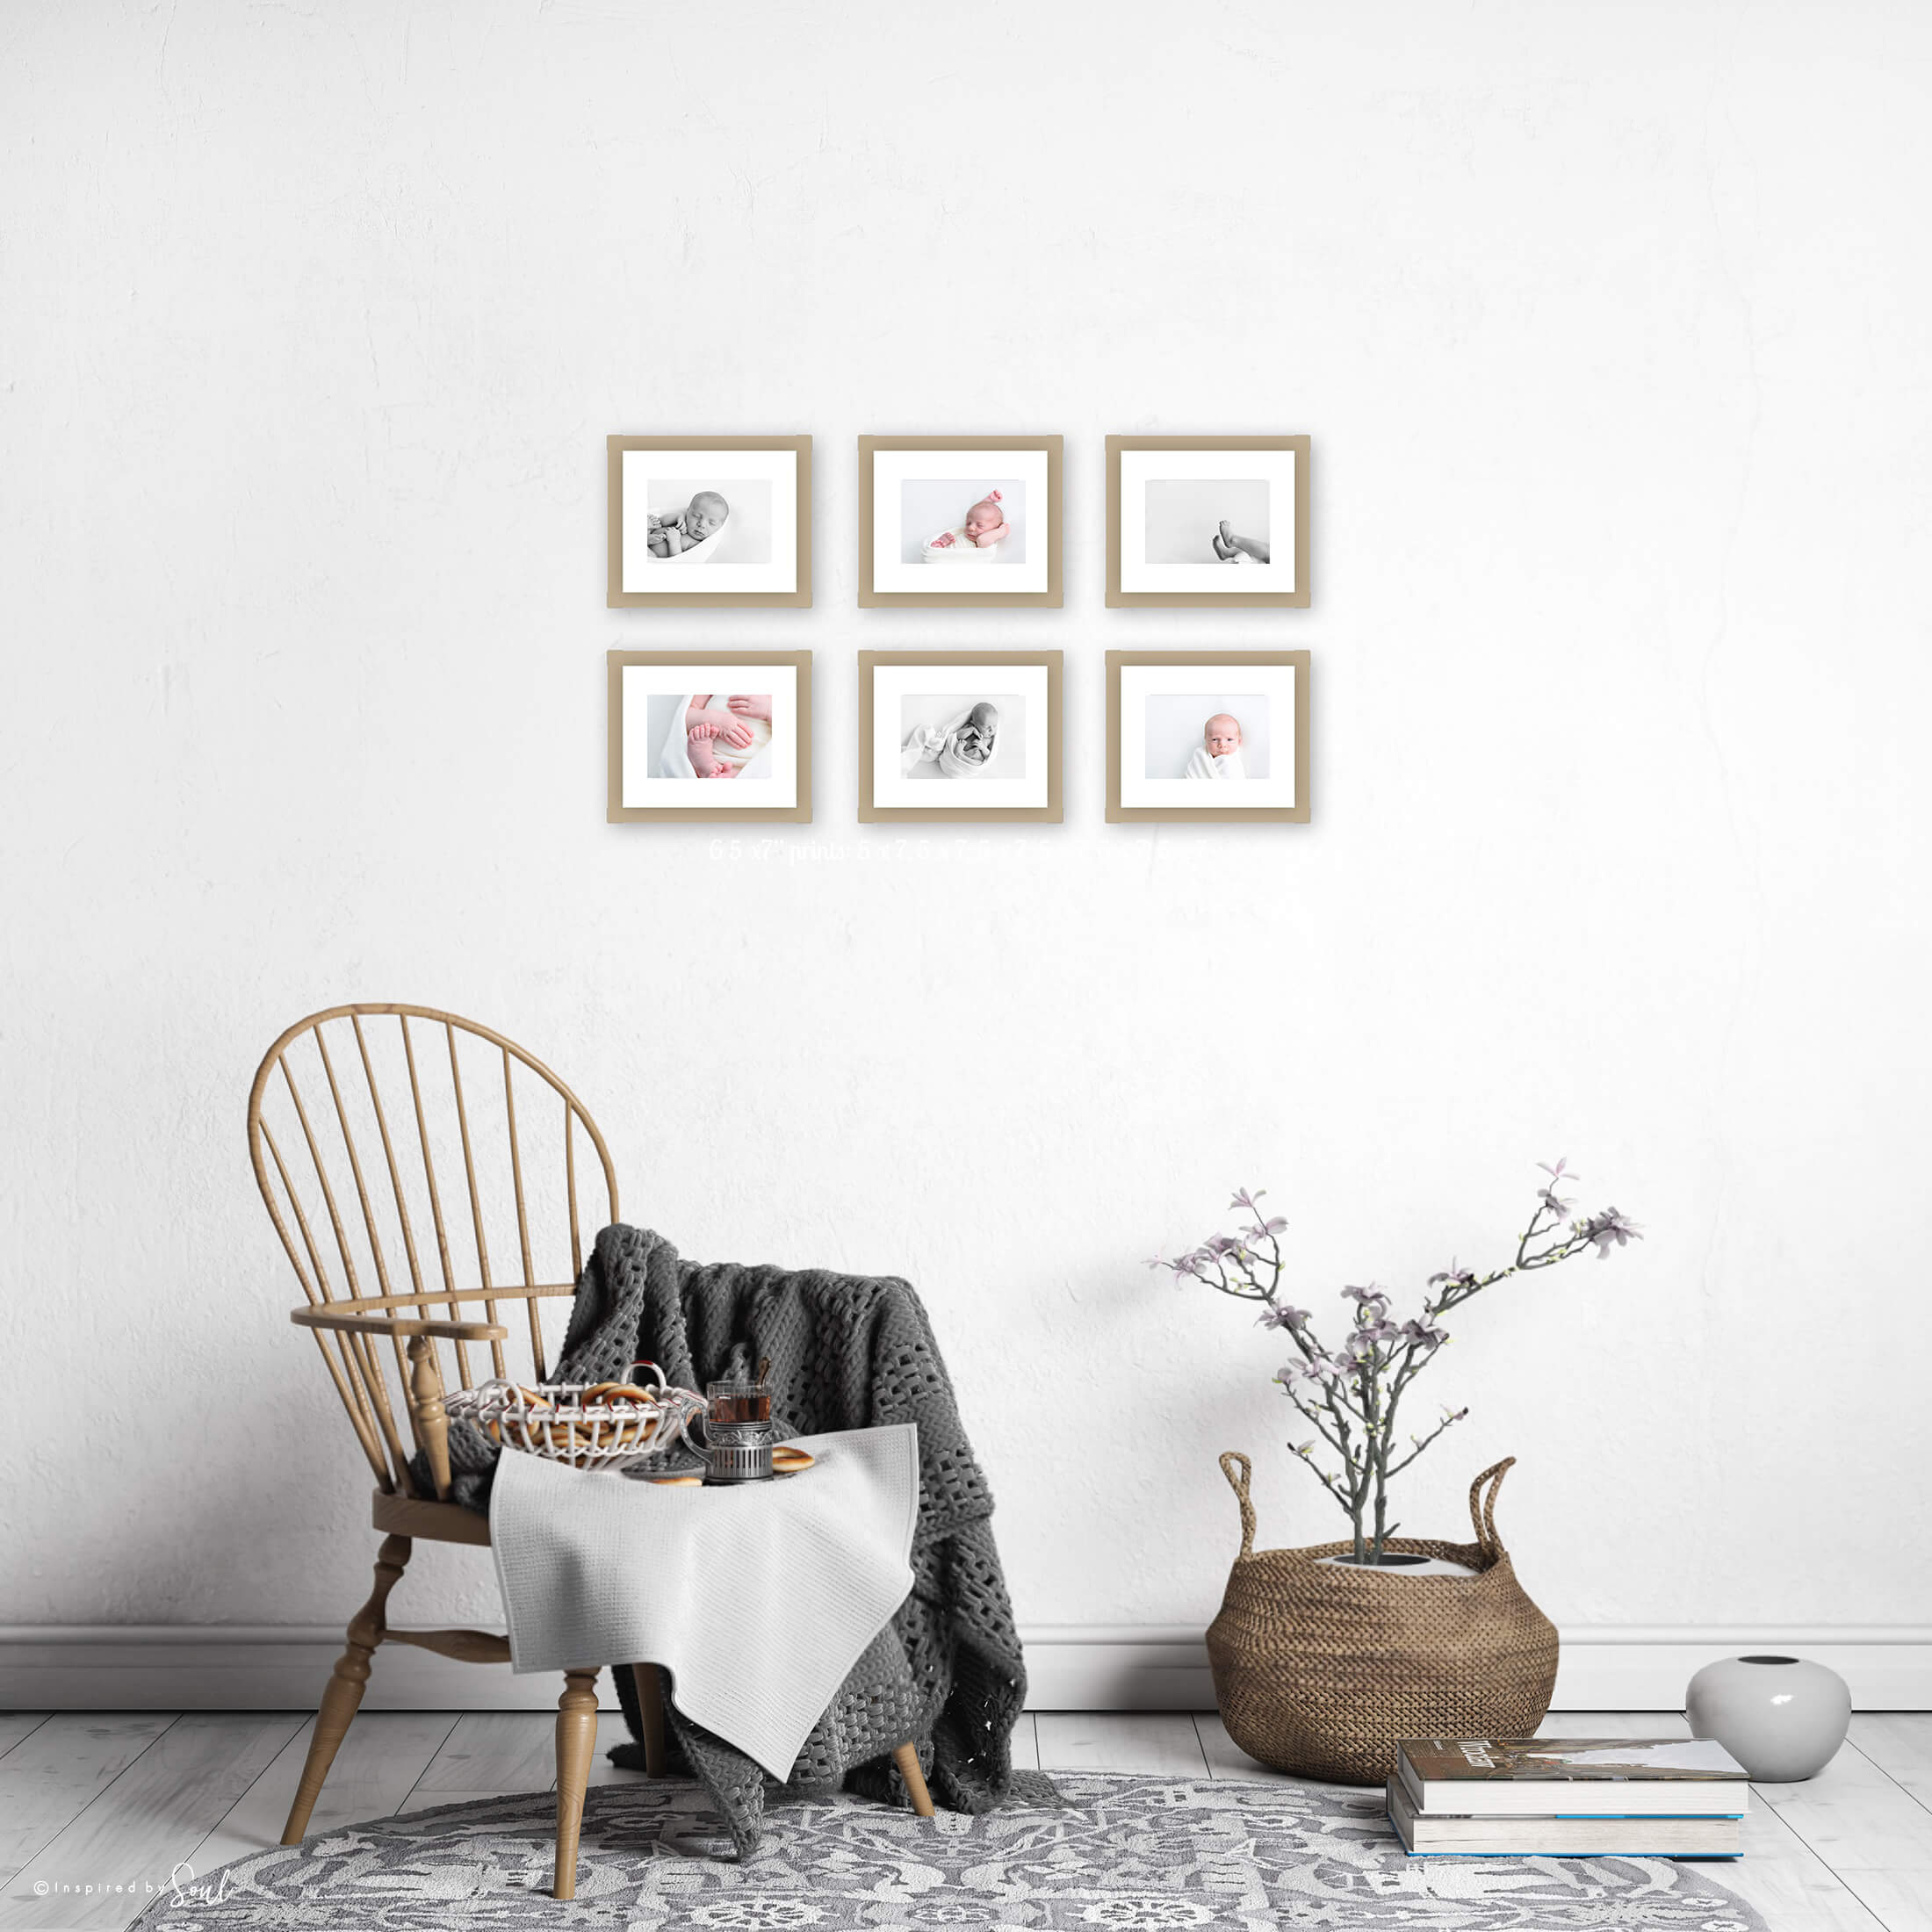 hobart newborn photography baby art wall frames